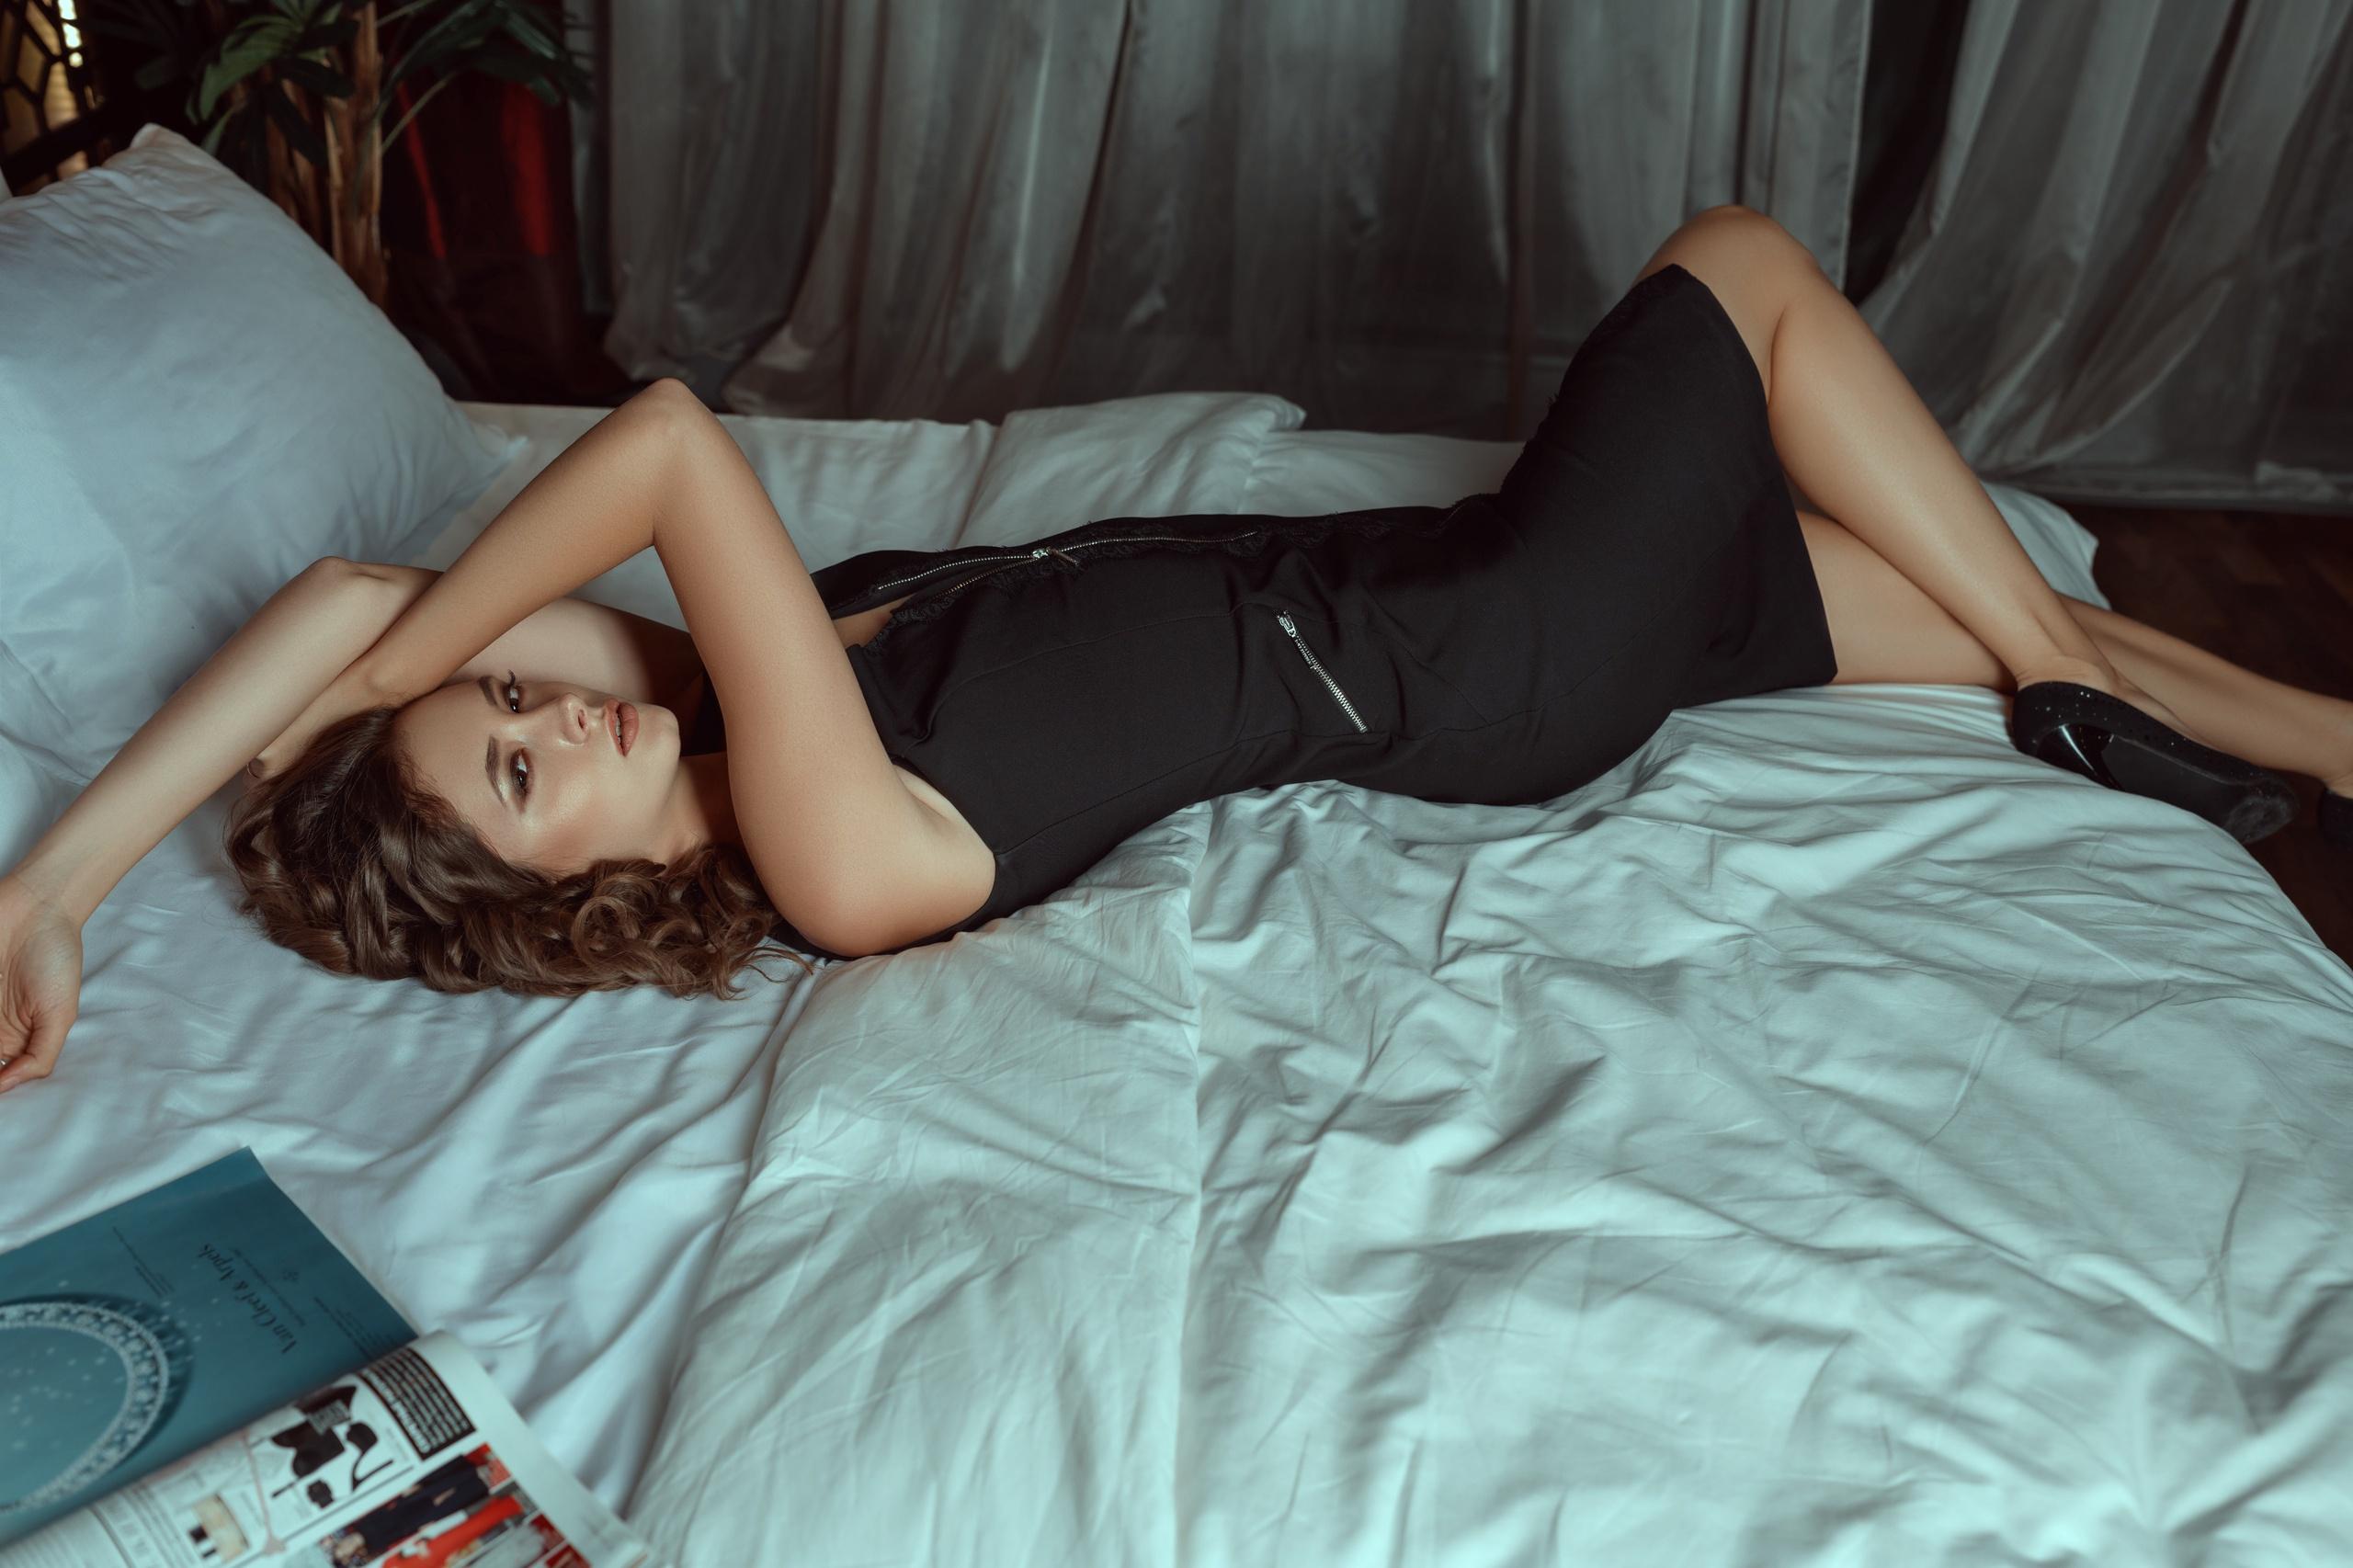 Sergei Vasiliev Model Women Brunette Wavy Hair Dark Eyes Dress Black Dress High Heels Legs Bare Shou 2560x1706